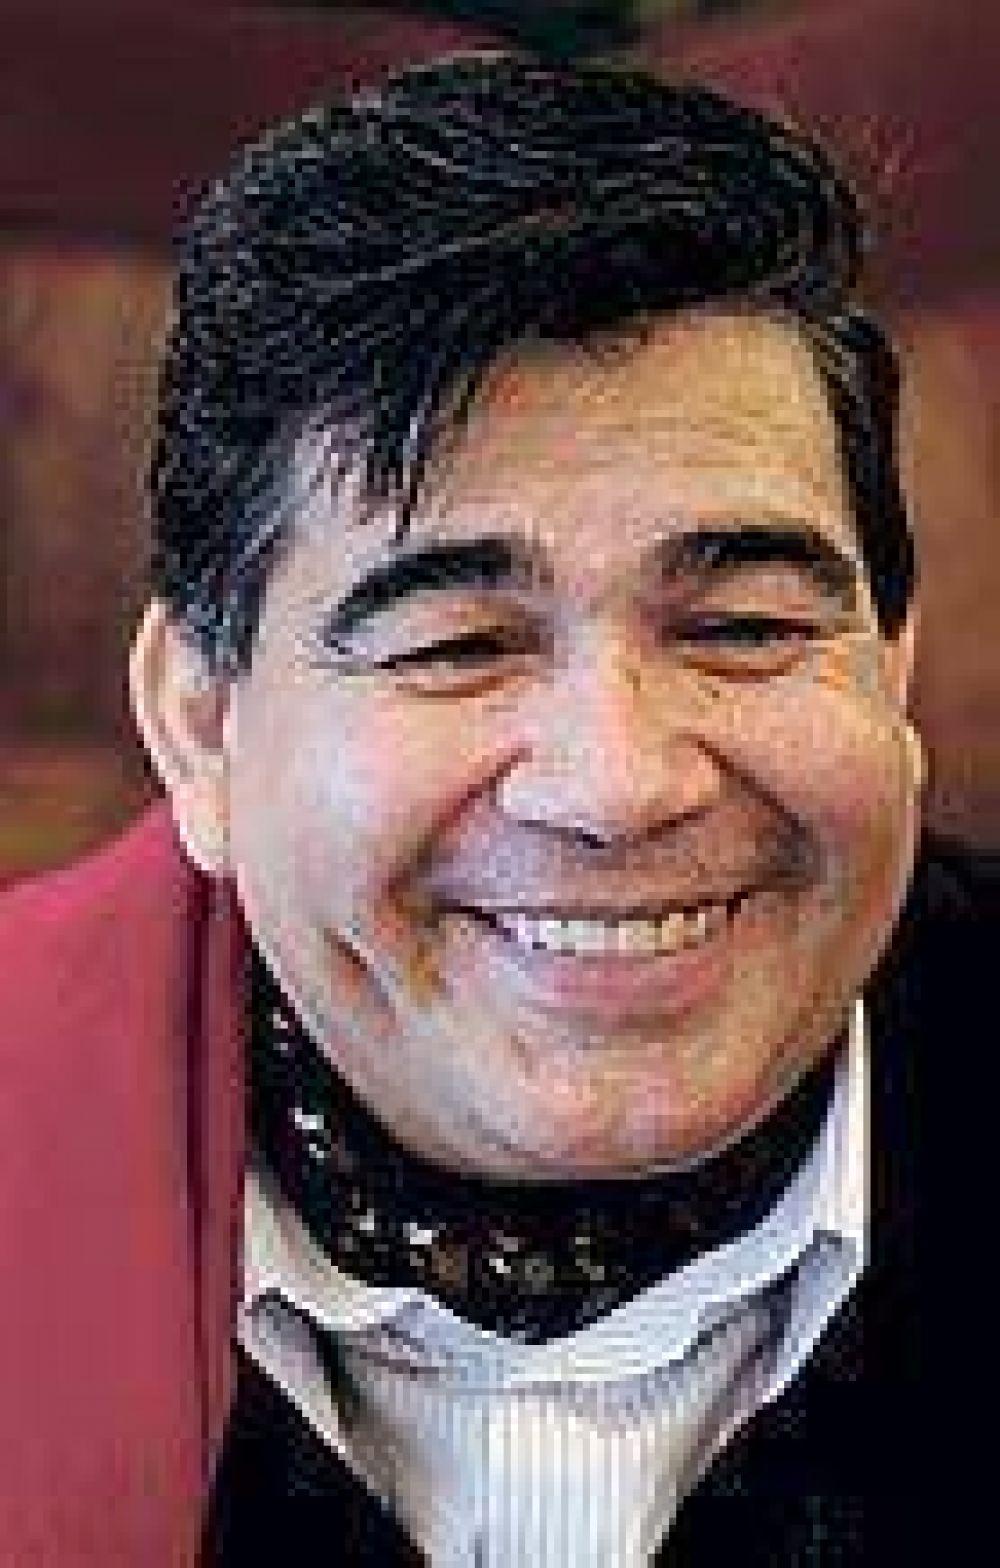 Ishii invirtió medio millón de pesos en dos empresas agropecuarias